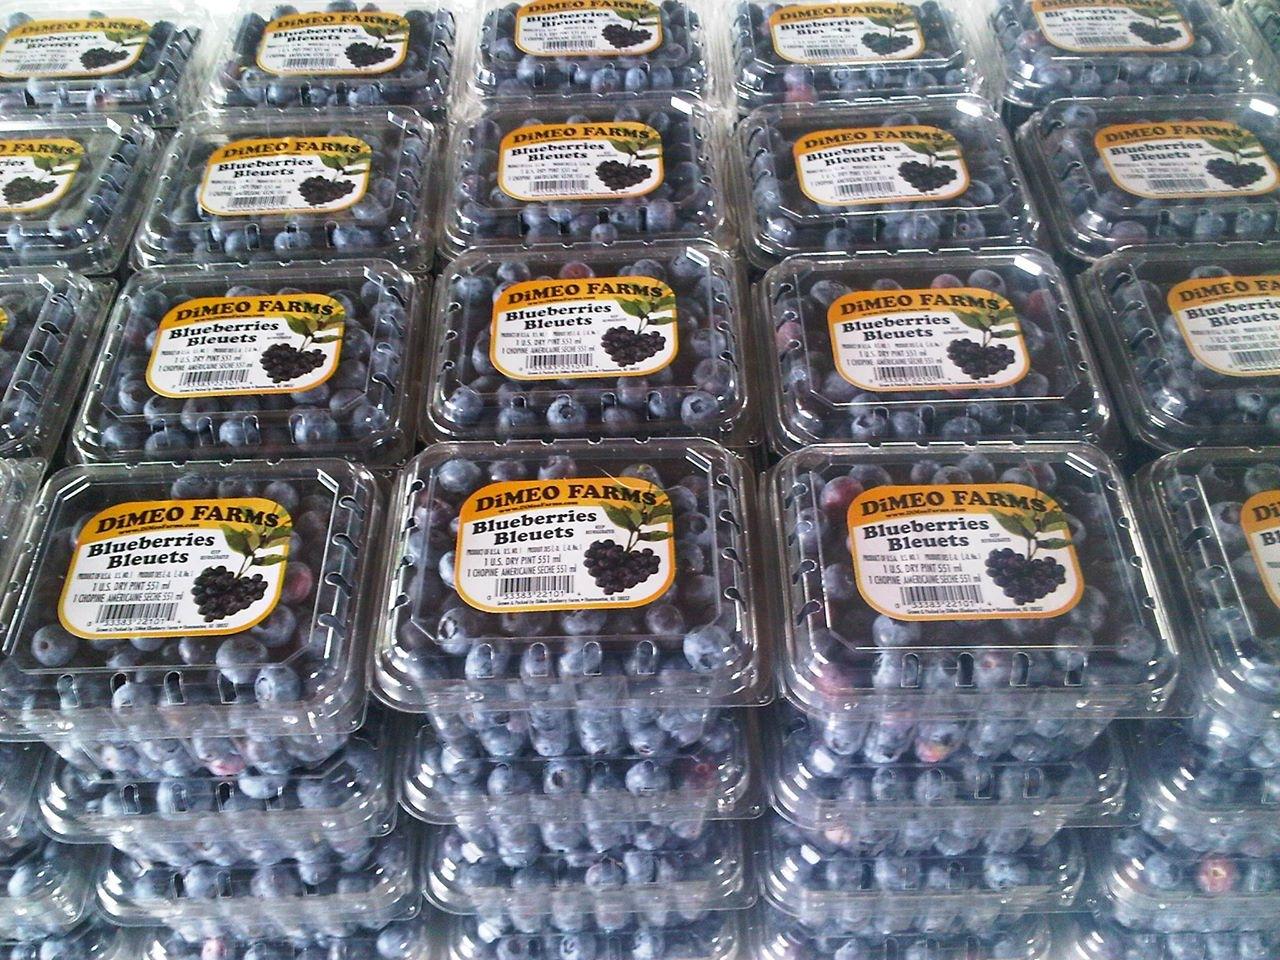 Buy Blueberry Plants Dimeo Farms Blueberry Plants